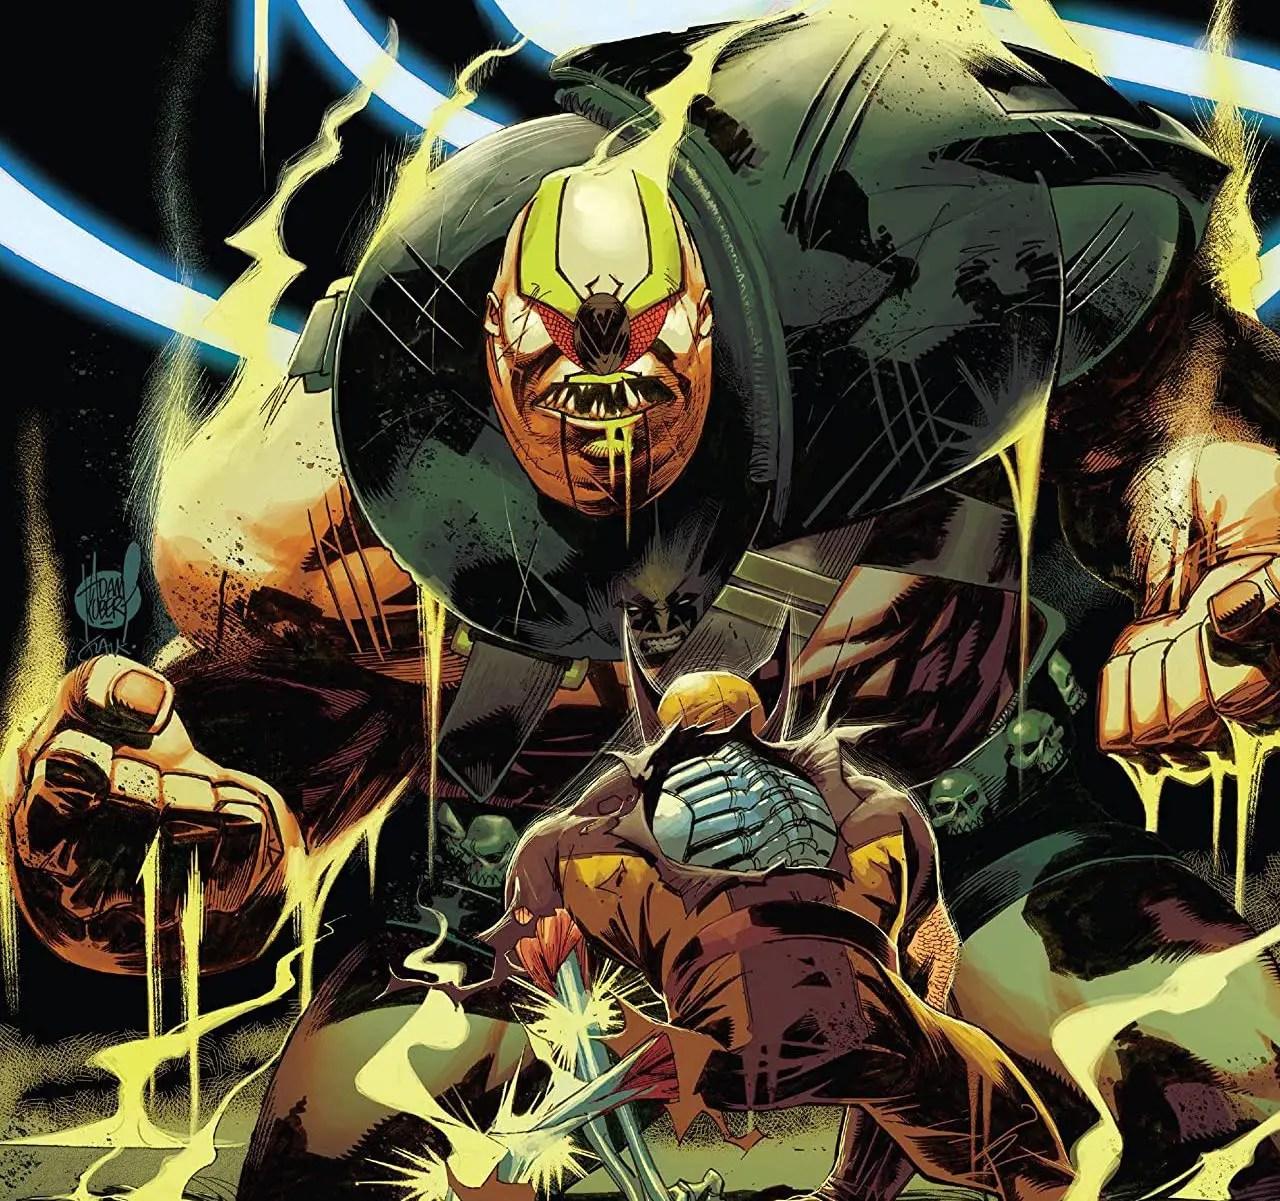 'Wolverine' #15 reveals much about Solem